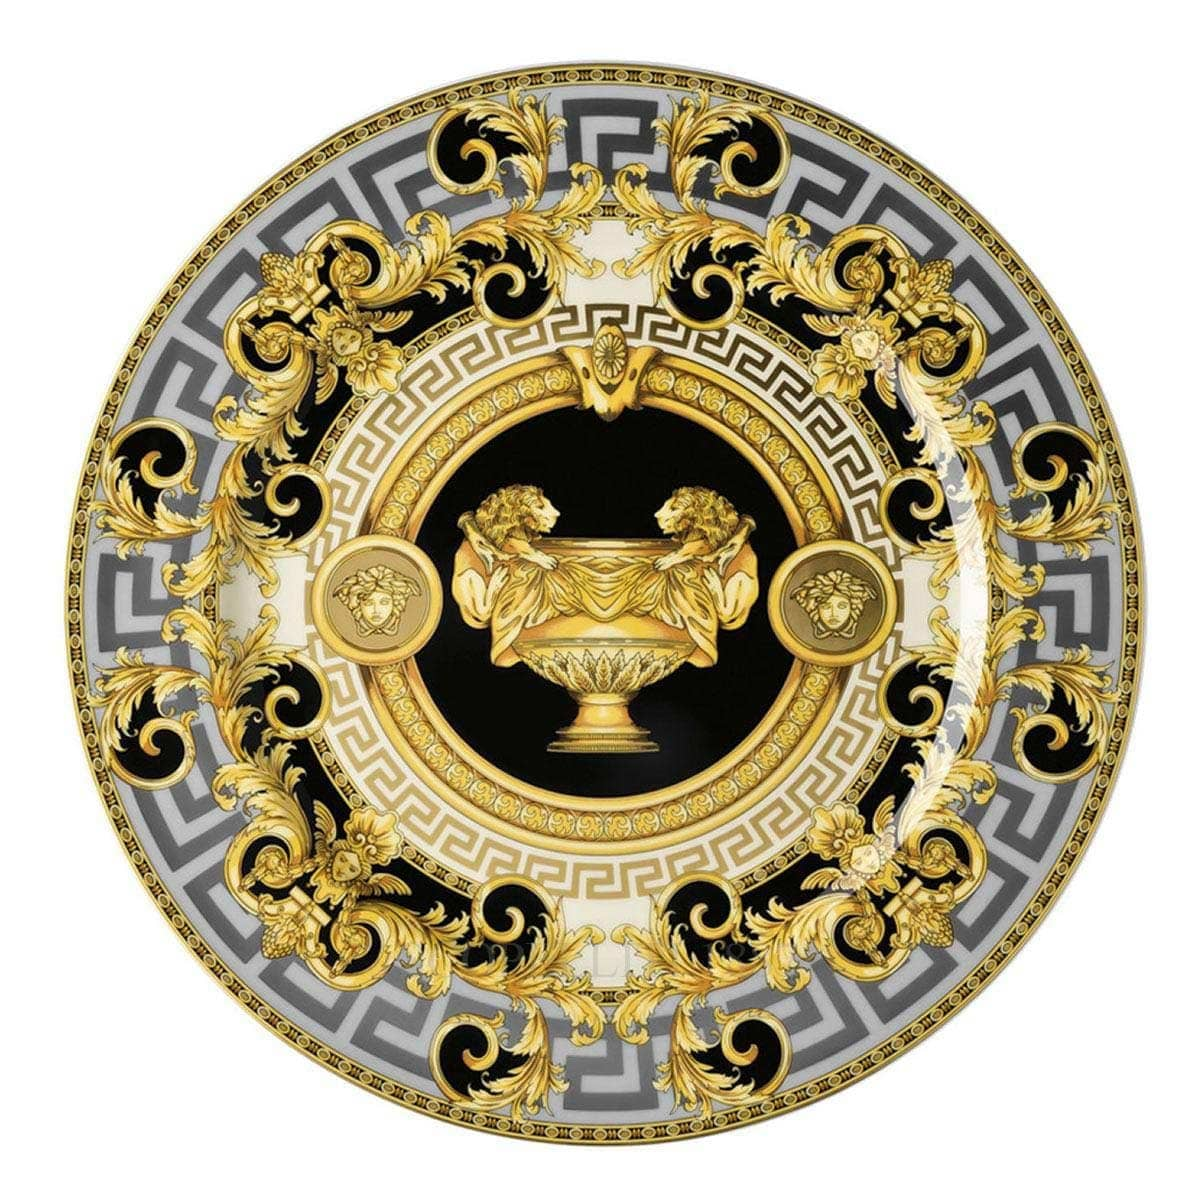 Versace Prestige Gala 2 Service Plate 30 cm by Rosenthal